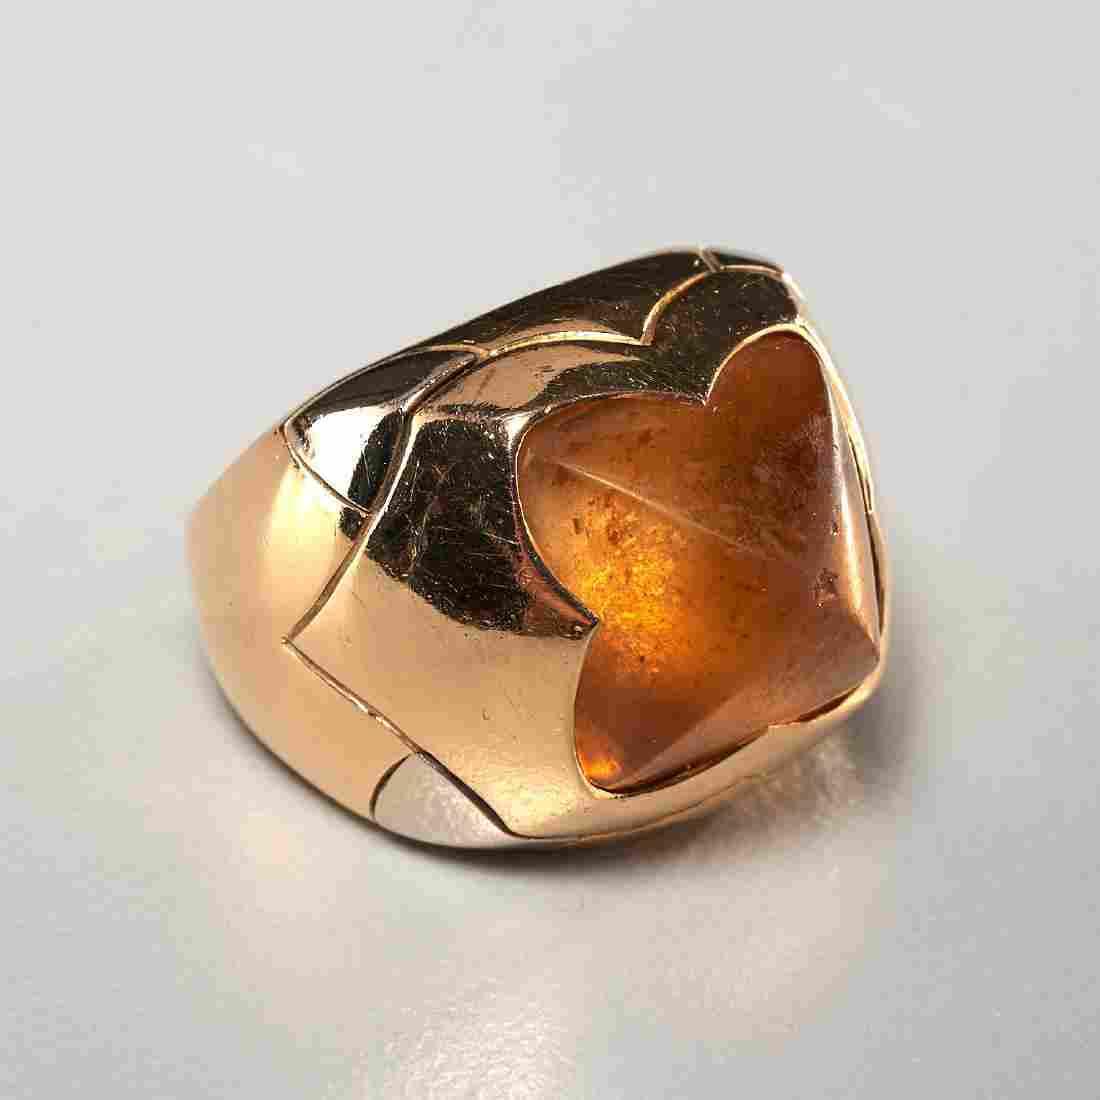 Bvlgari 18k gold and citrine pyramid ring